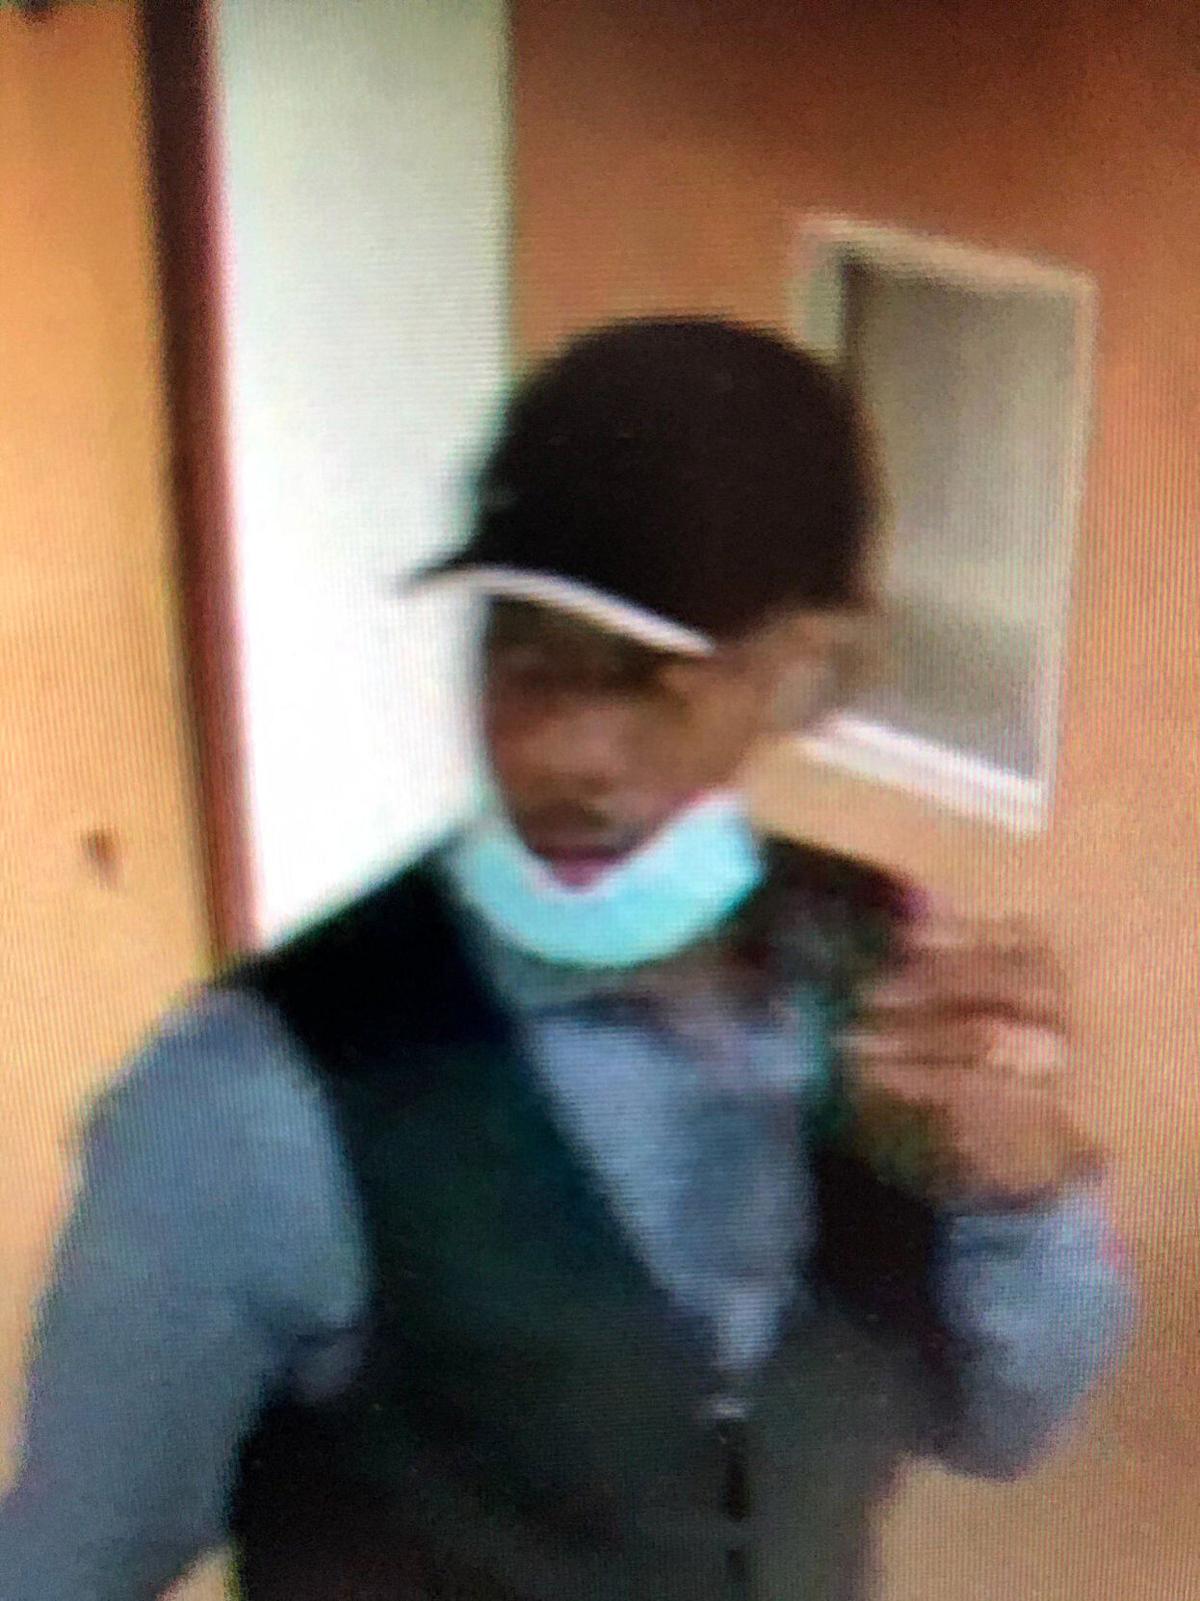 Shelbyville suspect 1